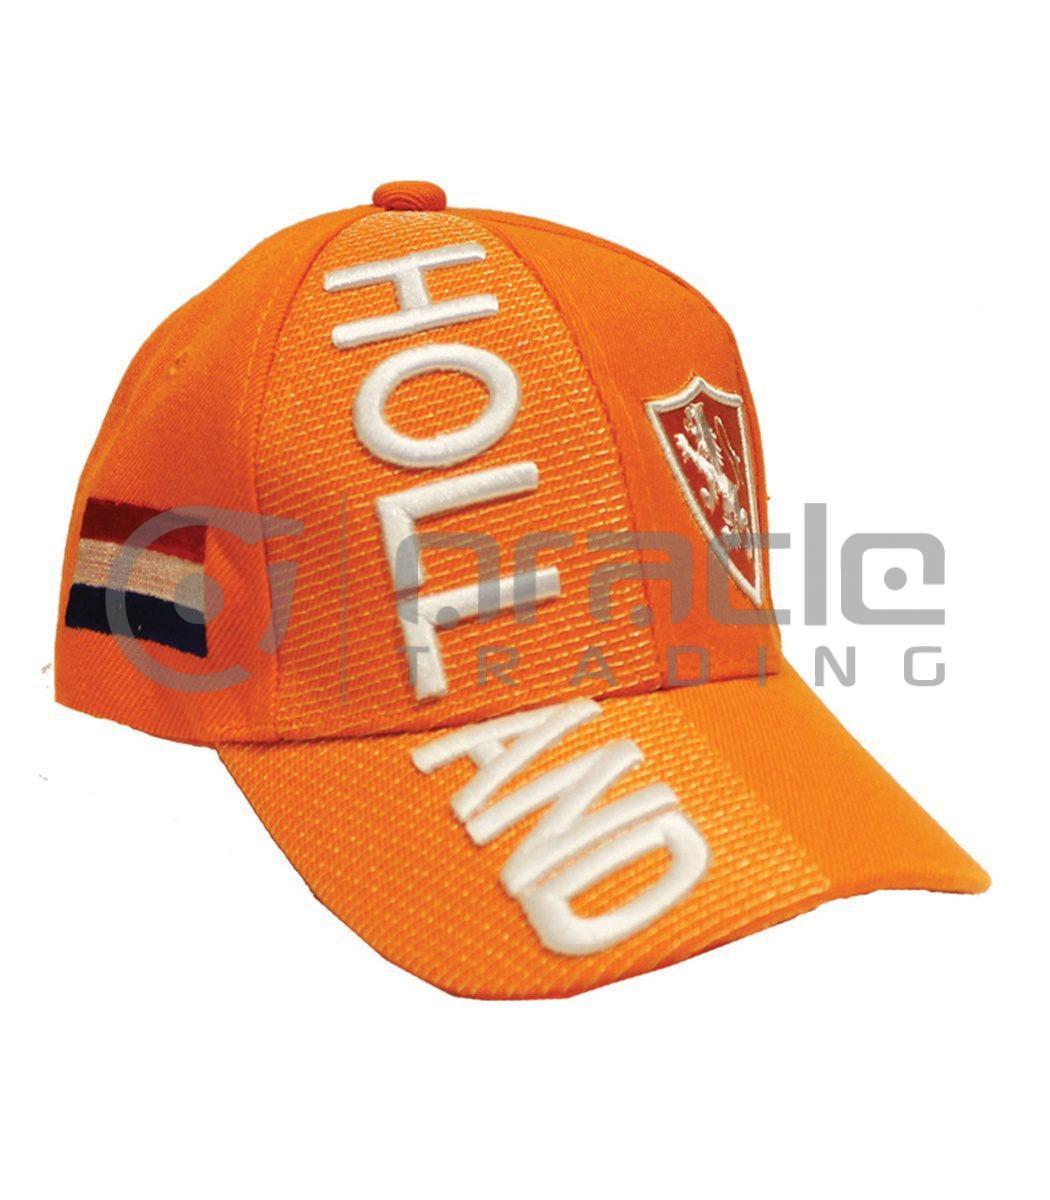 3D Holland Hat - Kid Size